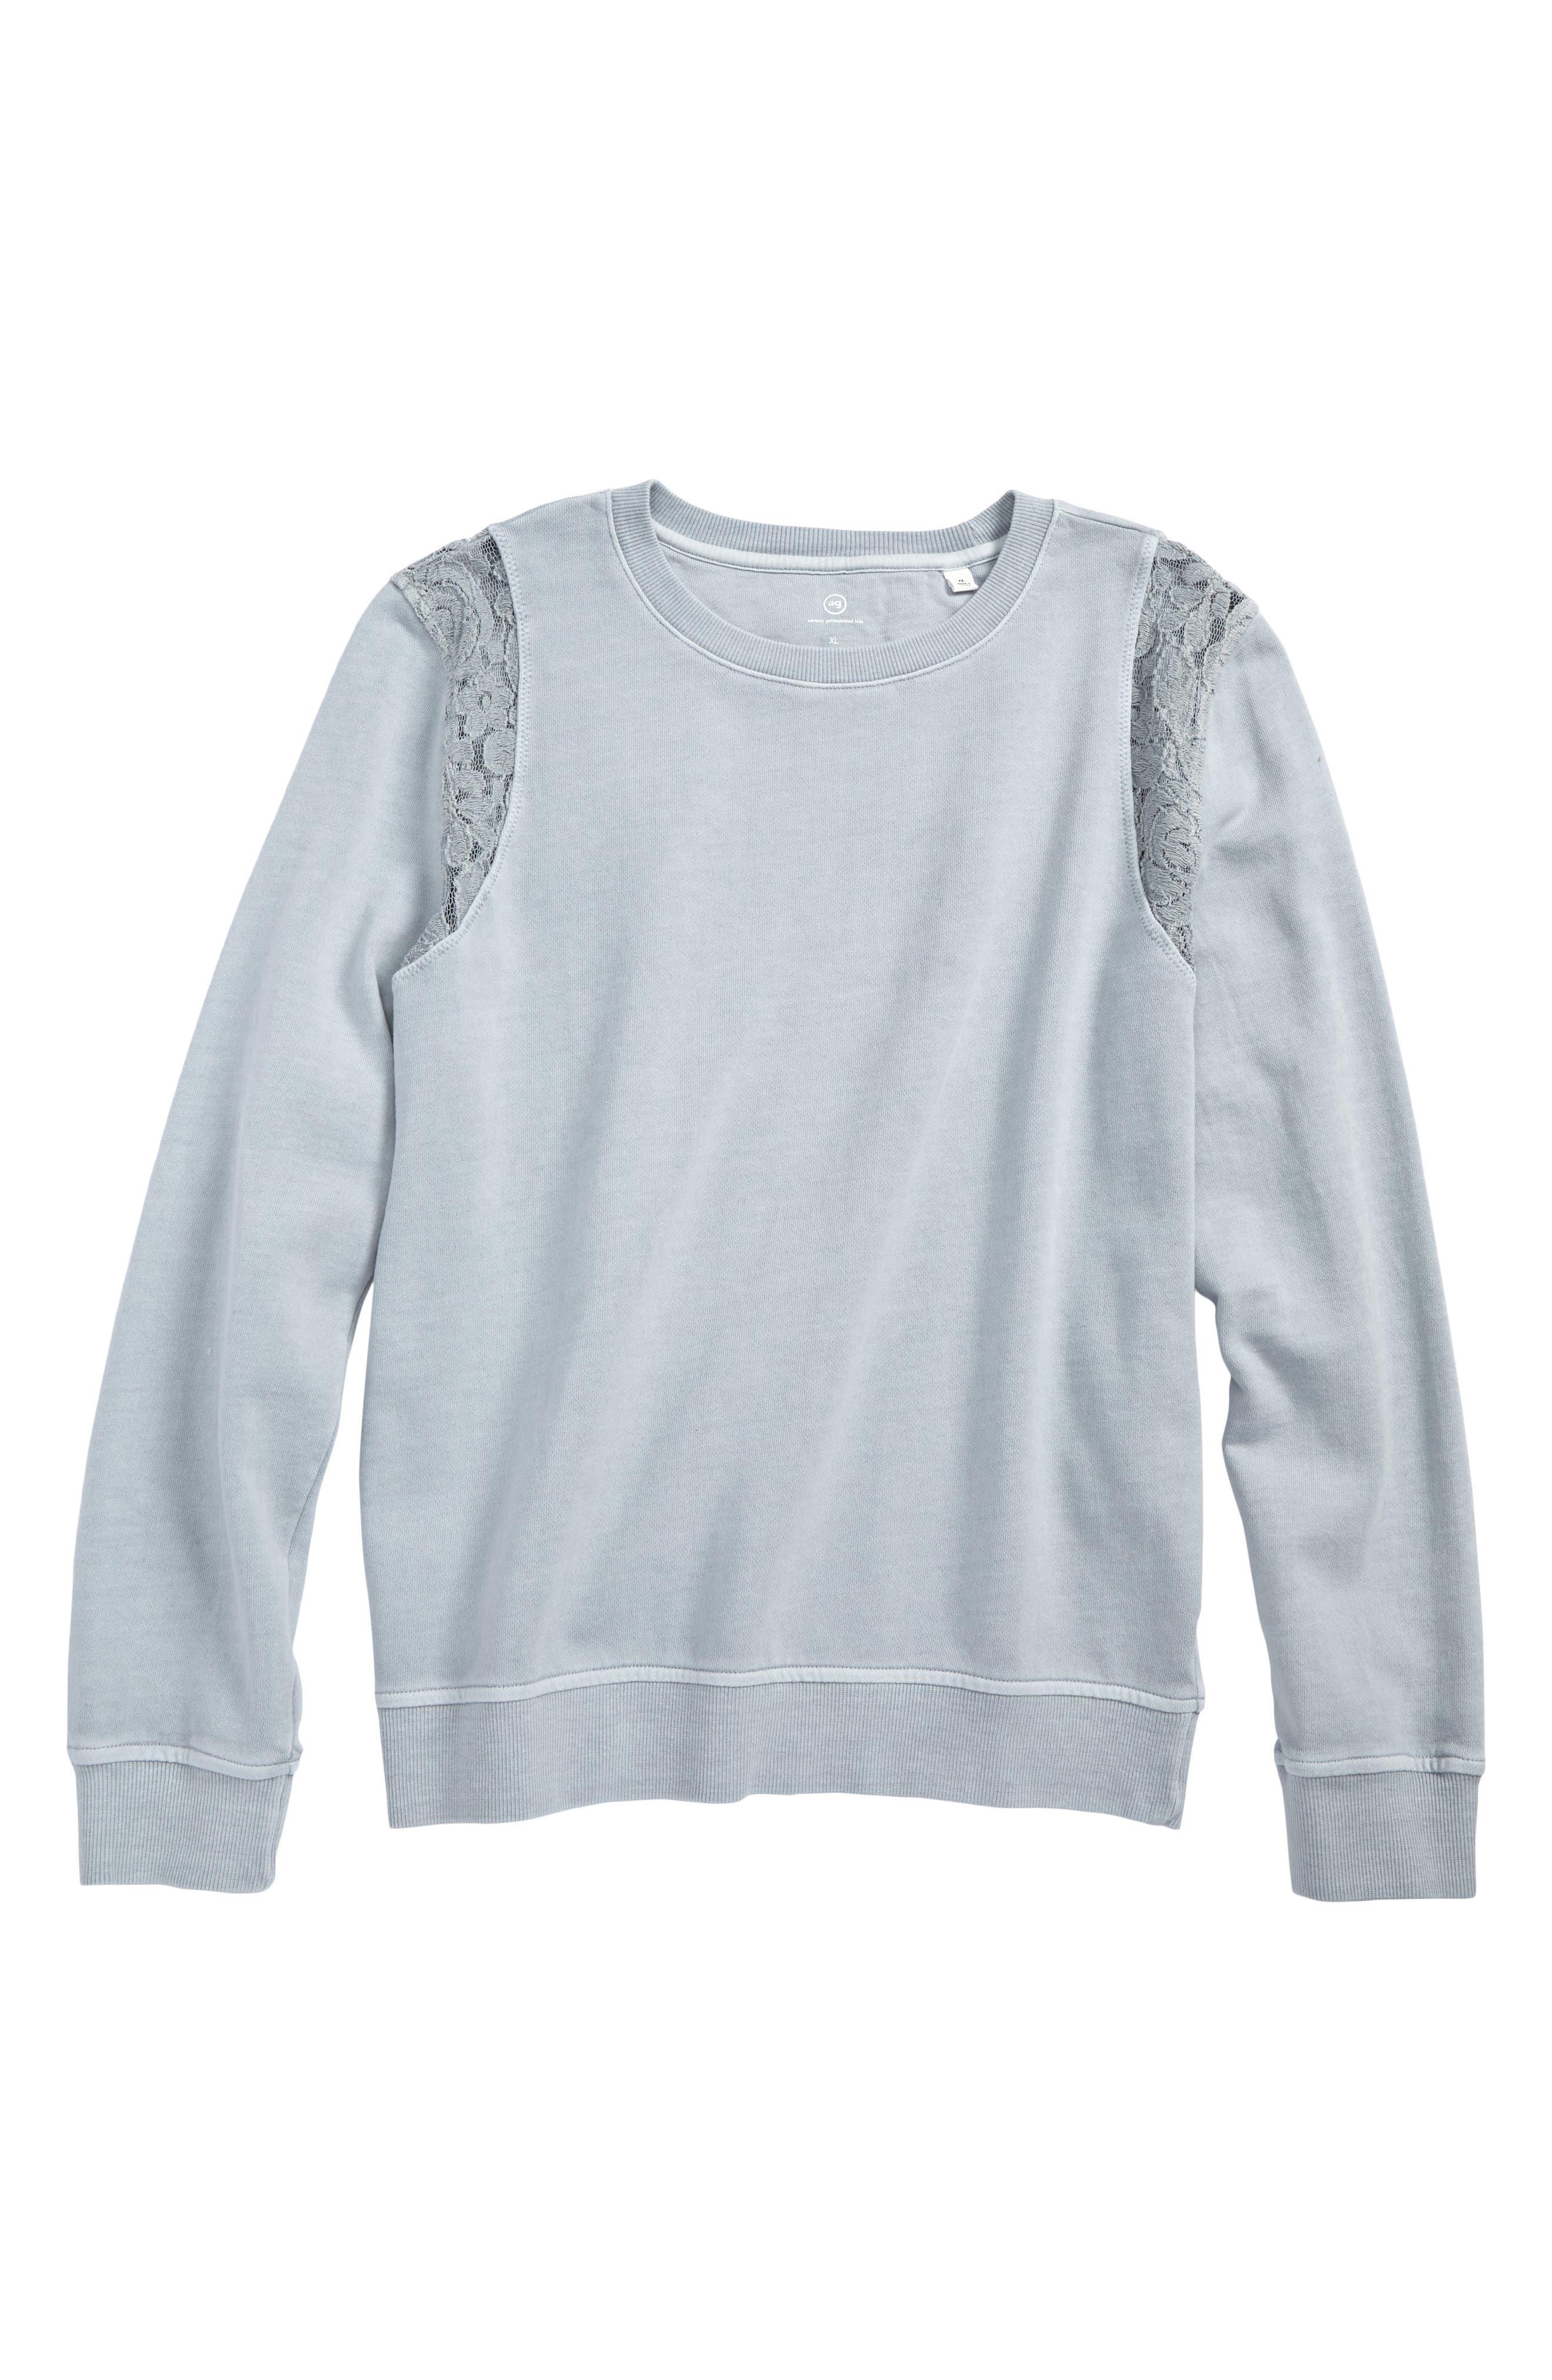 ag adriano goldschmied kids Lace Sweatshirt (Big Girls)